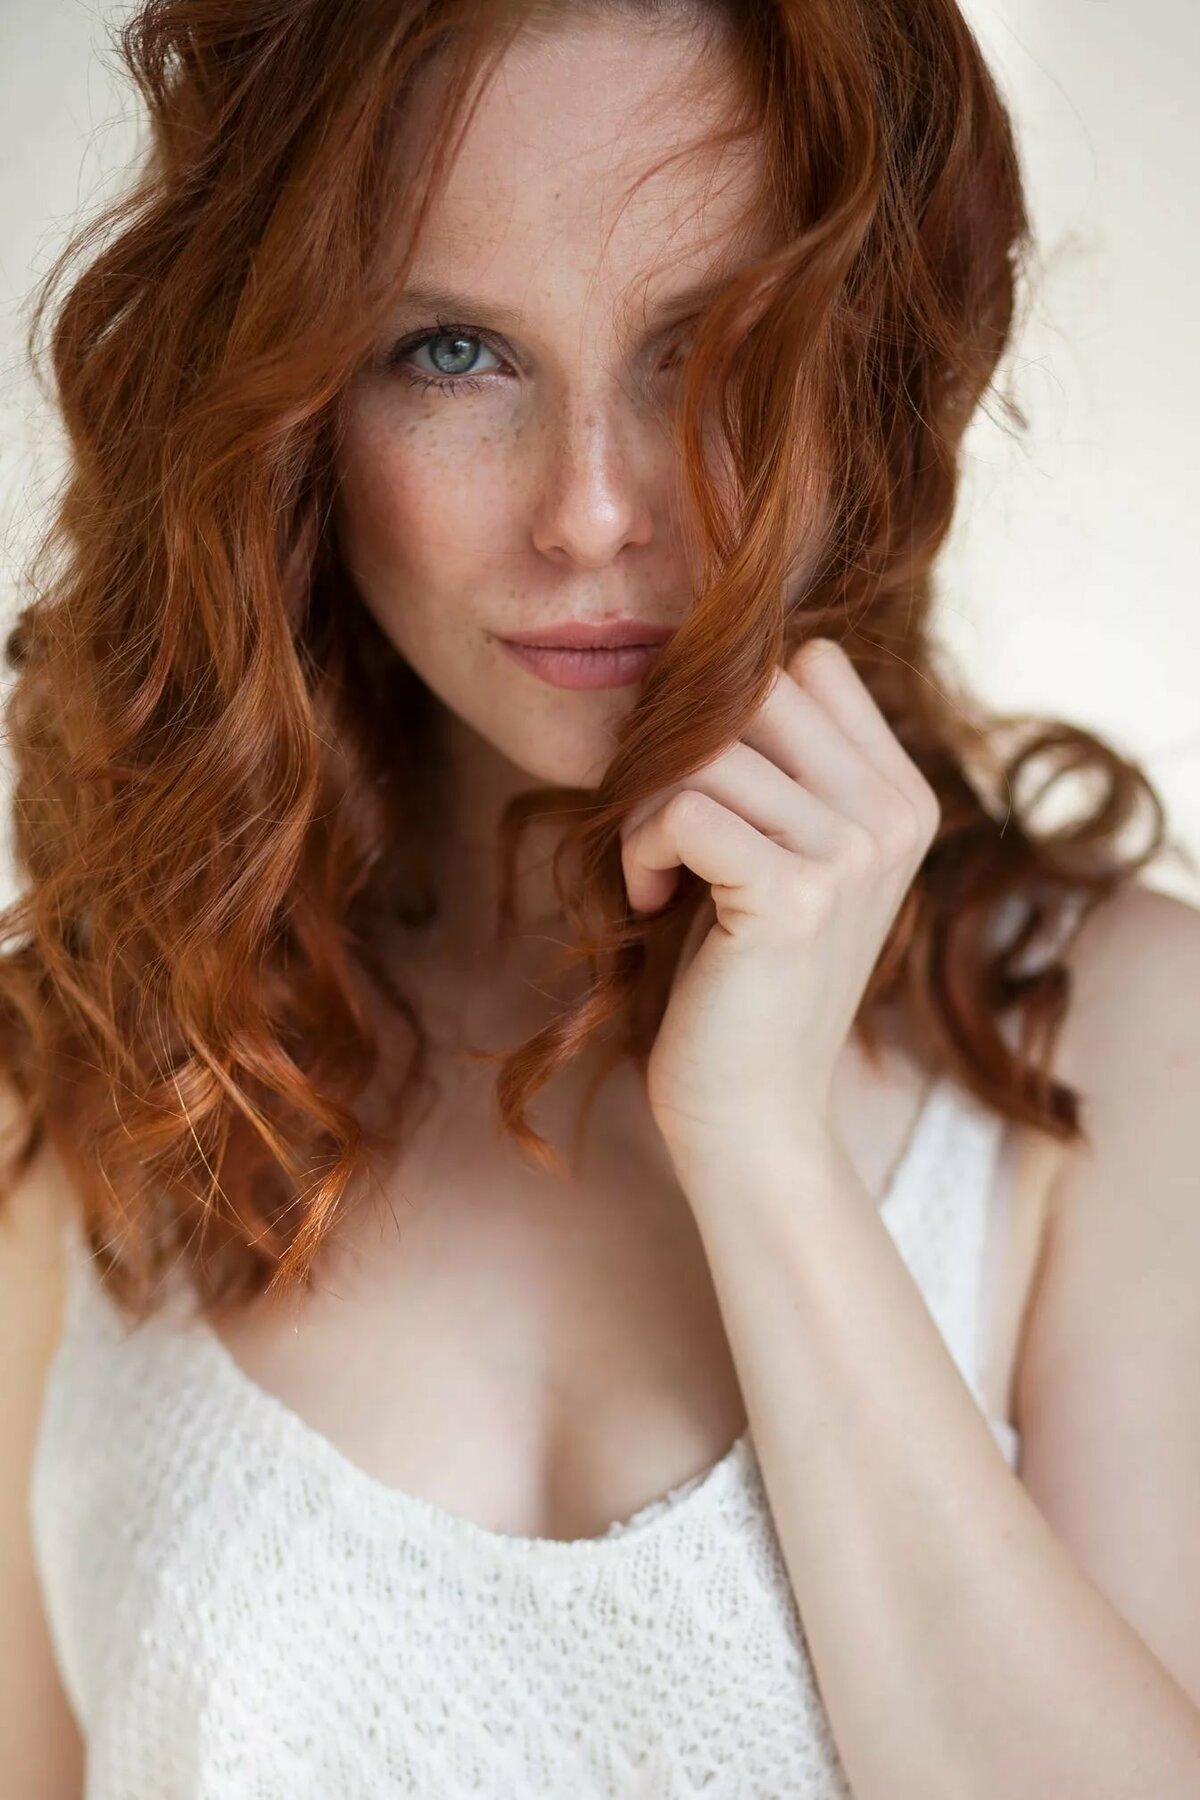 Naked cumshot redhead nude home photos arora khan nude